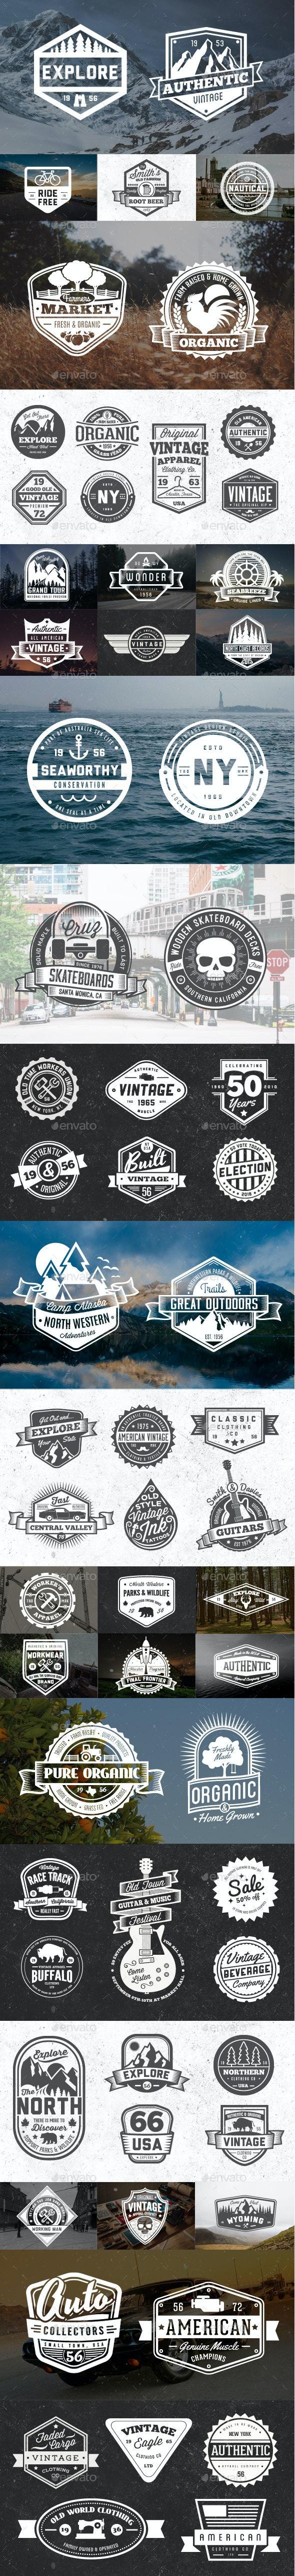 65 Vintage Badges and Logos Bundle - Badges & Stickers Web Elements